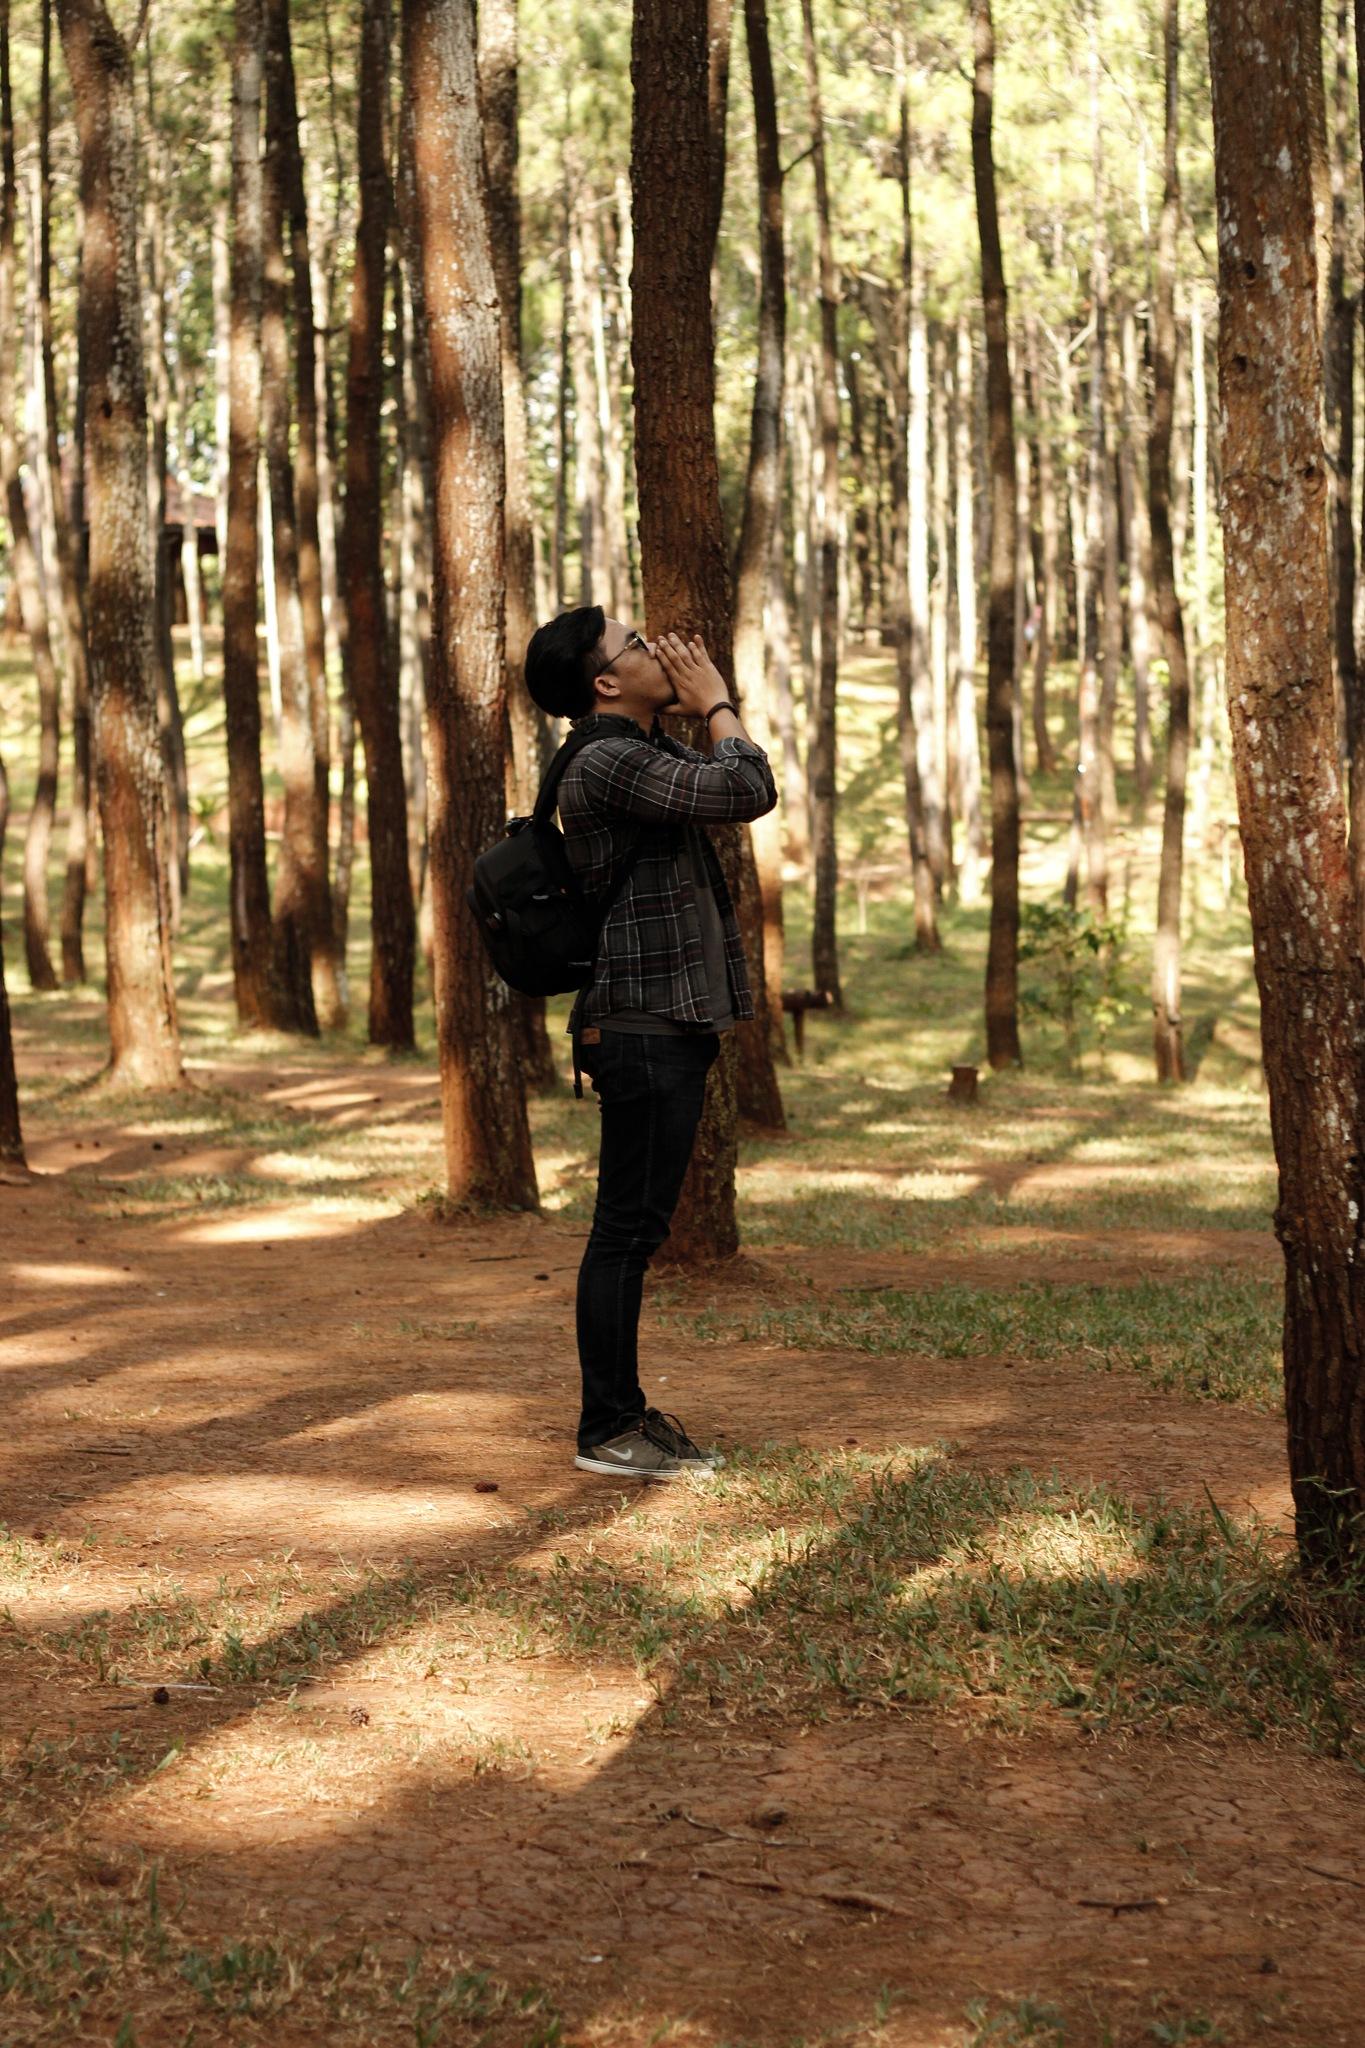 The boy and Pine by Simon Giando